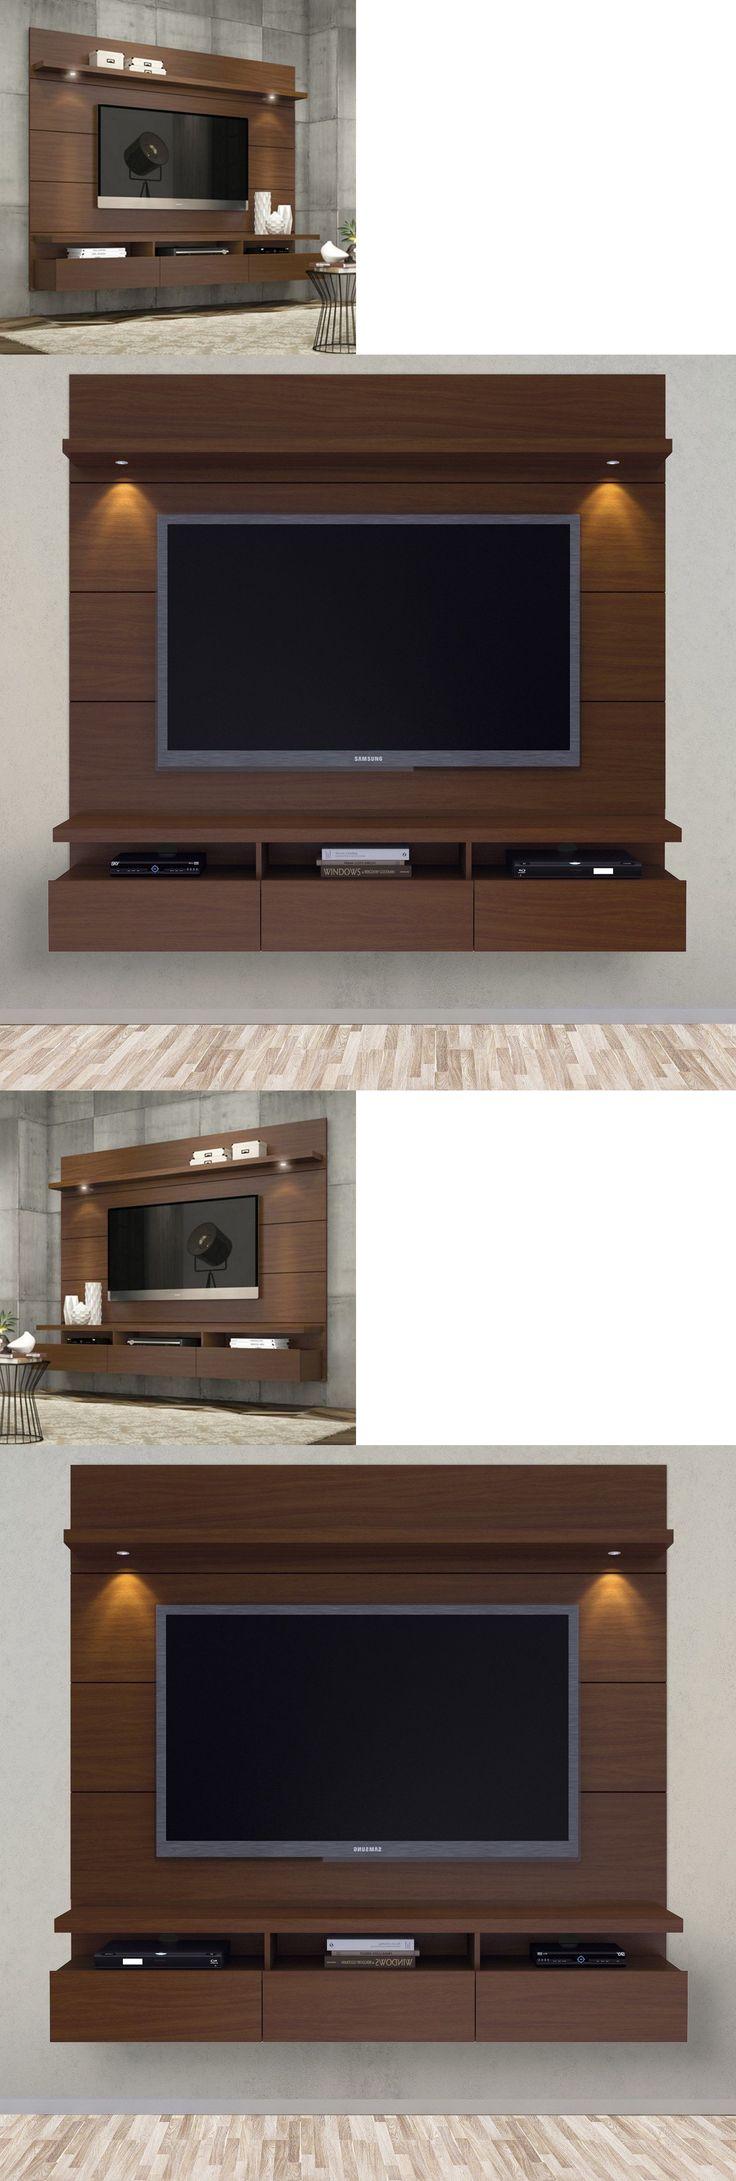 17 best ideas about modern tv wall units on pinterest tv. Black Bedroom Furniture Sets. Home Design Ideas